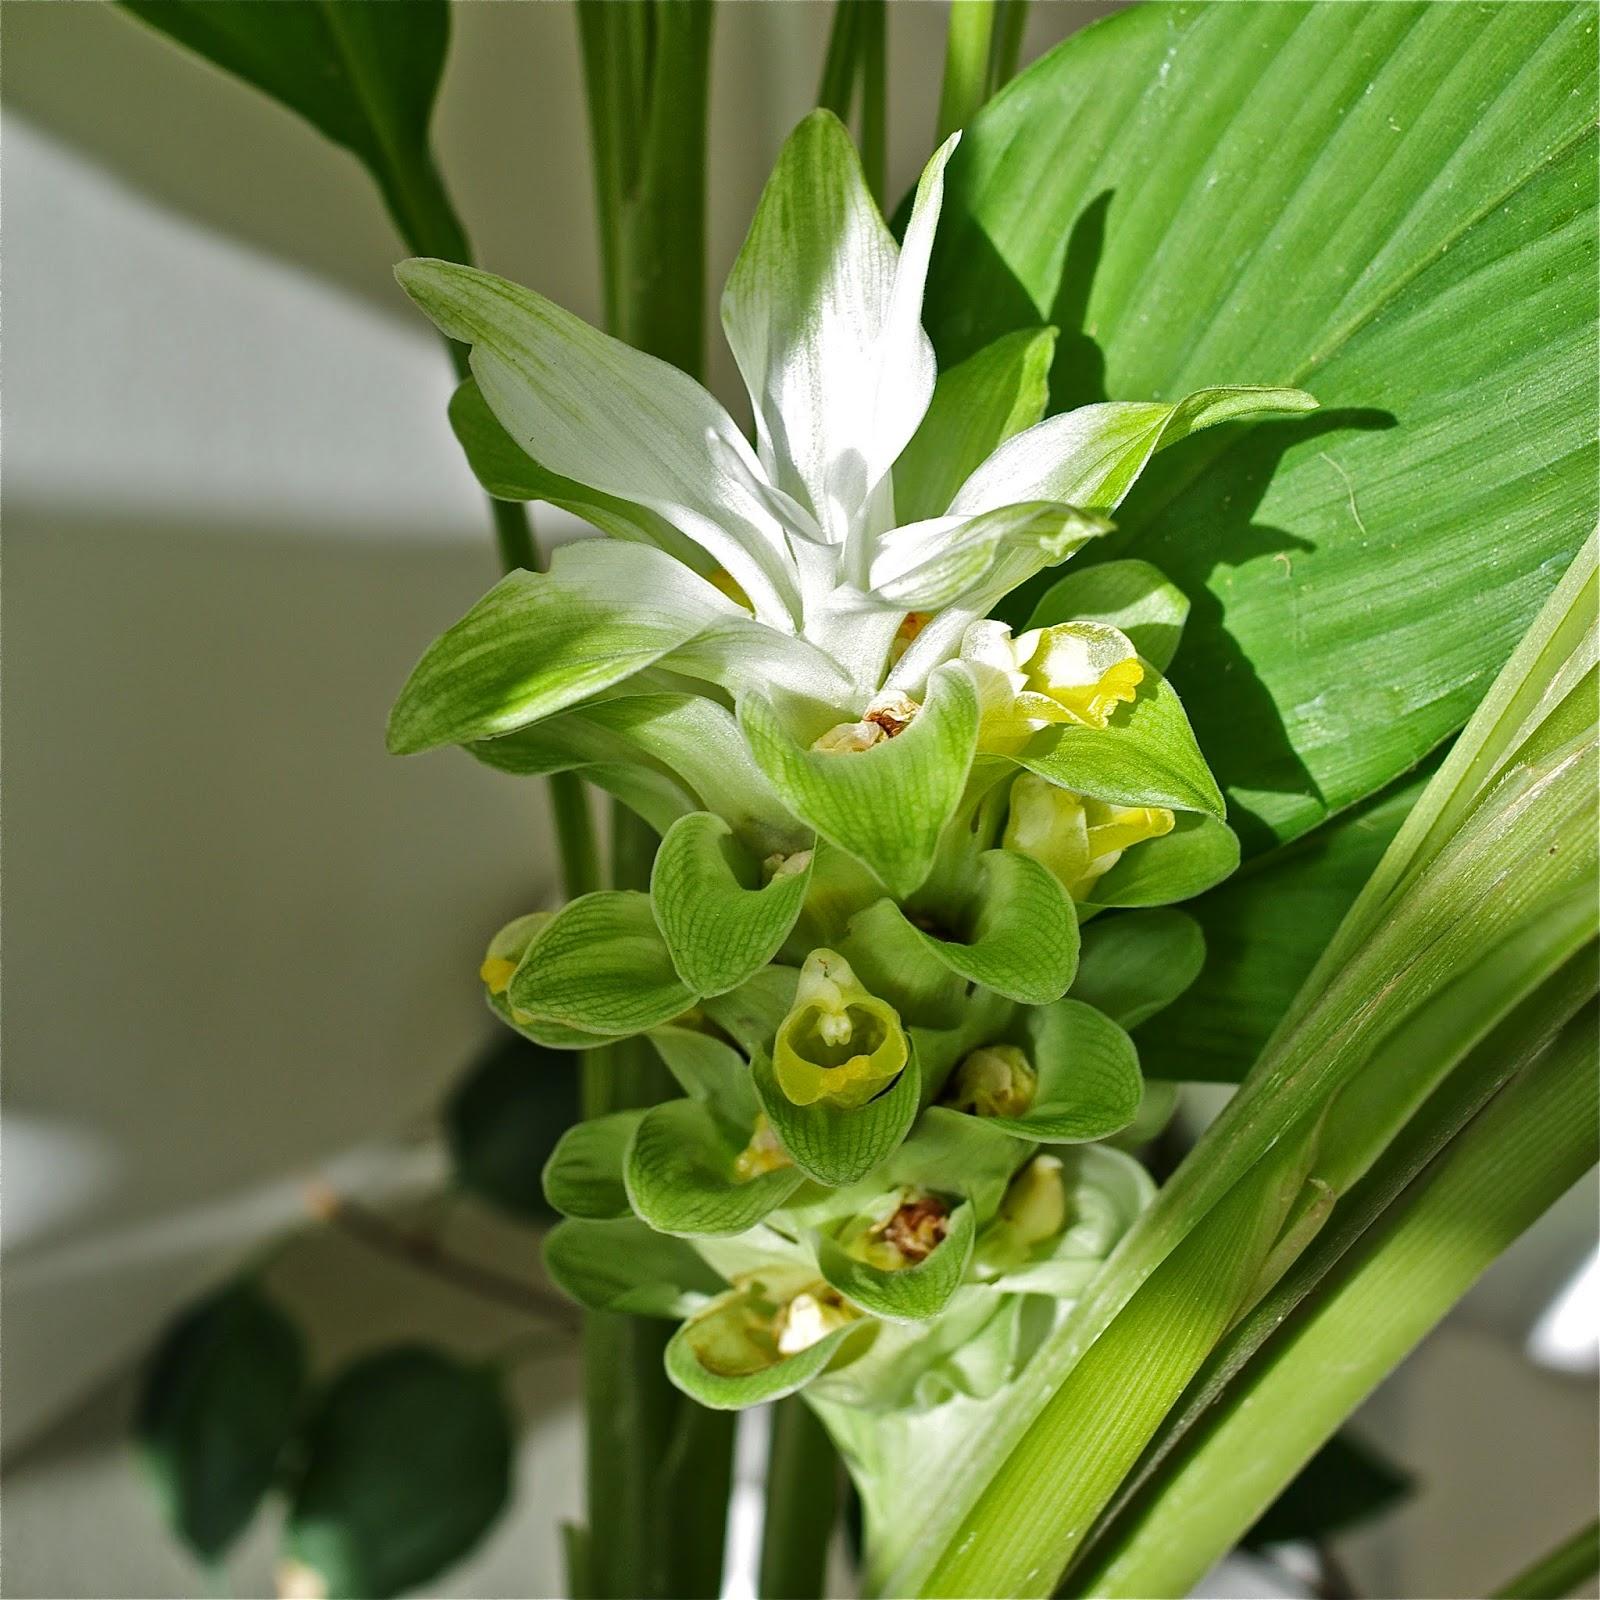 persil et oignon pays curcuma en fleur. Black Bedroom Furniture Sets. Home Design Ideas